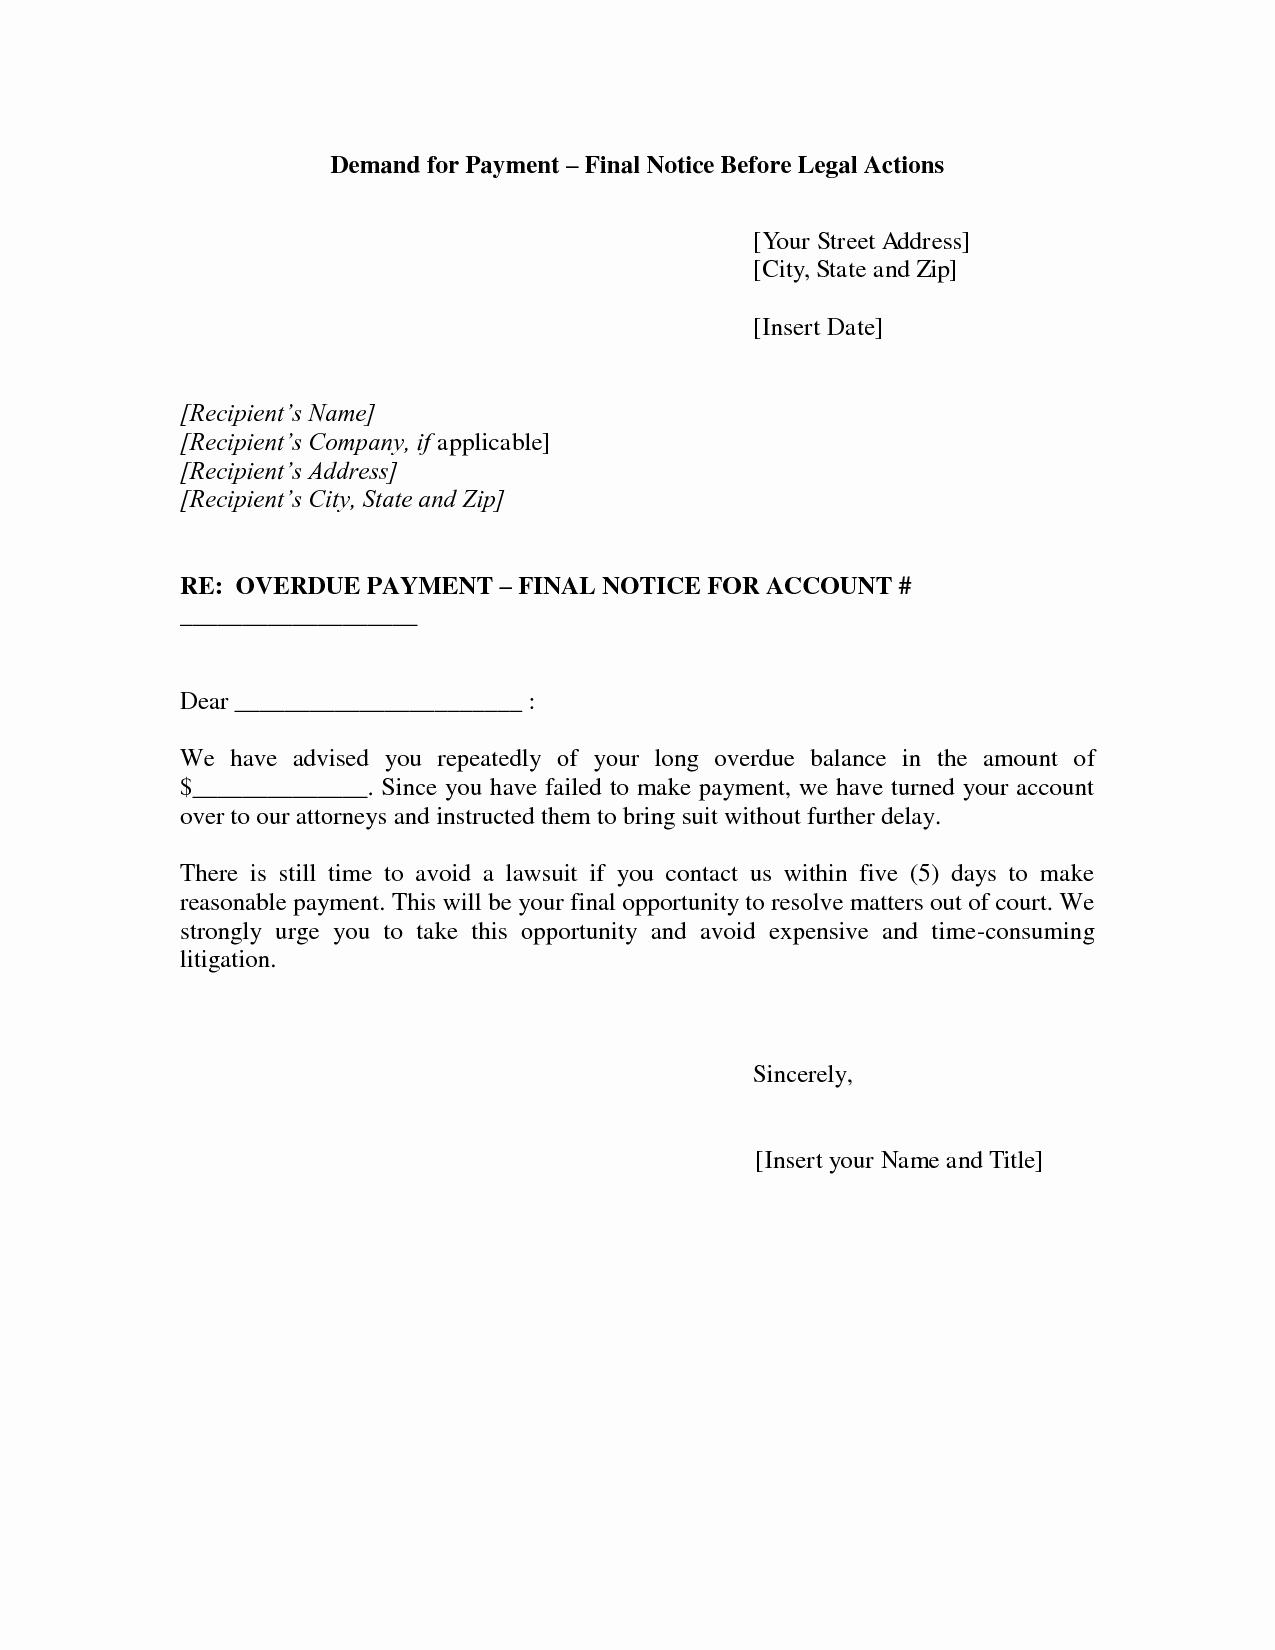 post final notice letter